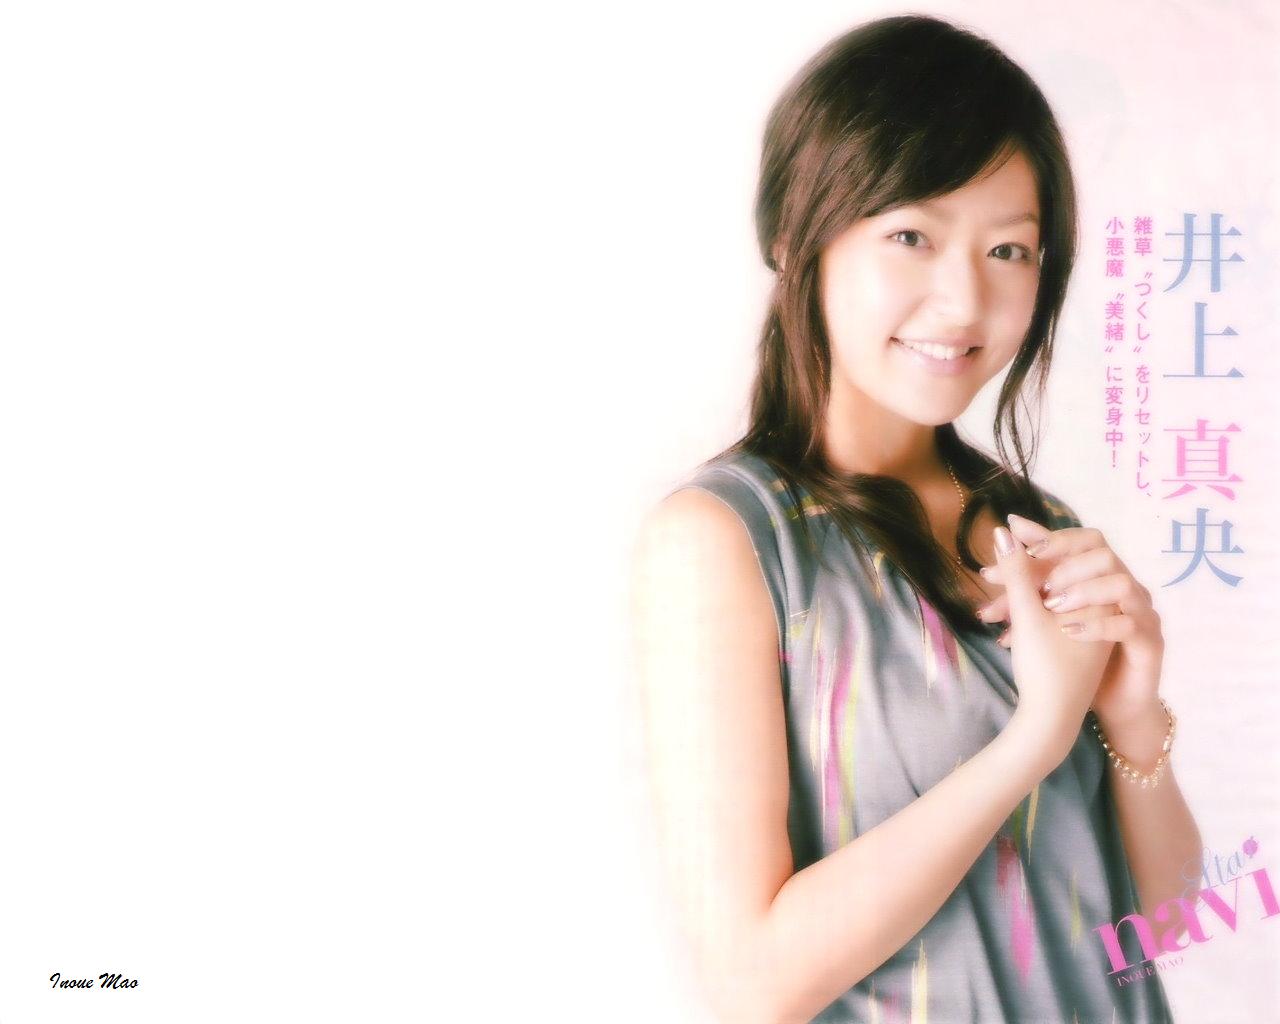 Inoue mao oguri shun drama - Watch the originals episode 1 project